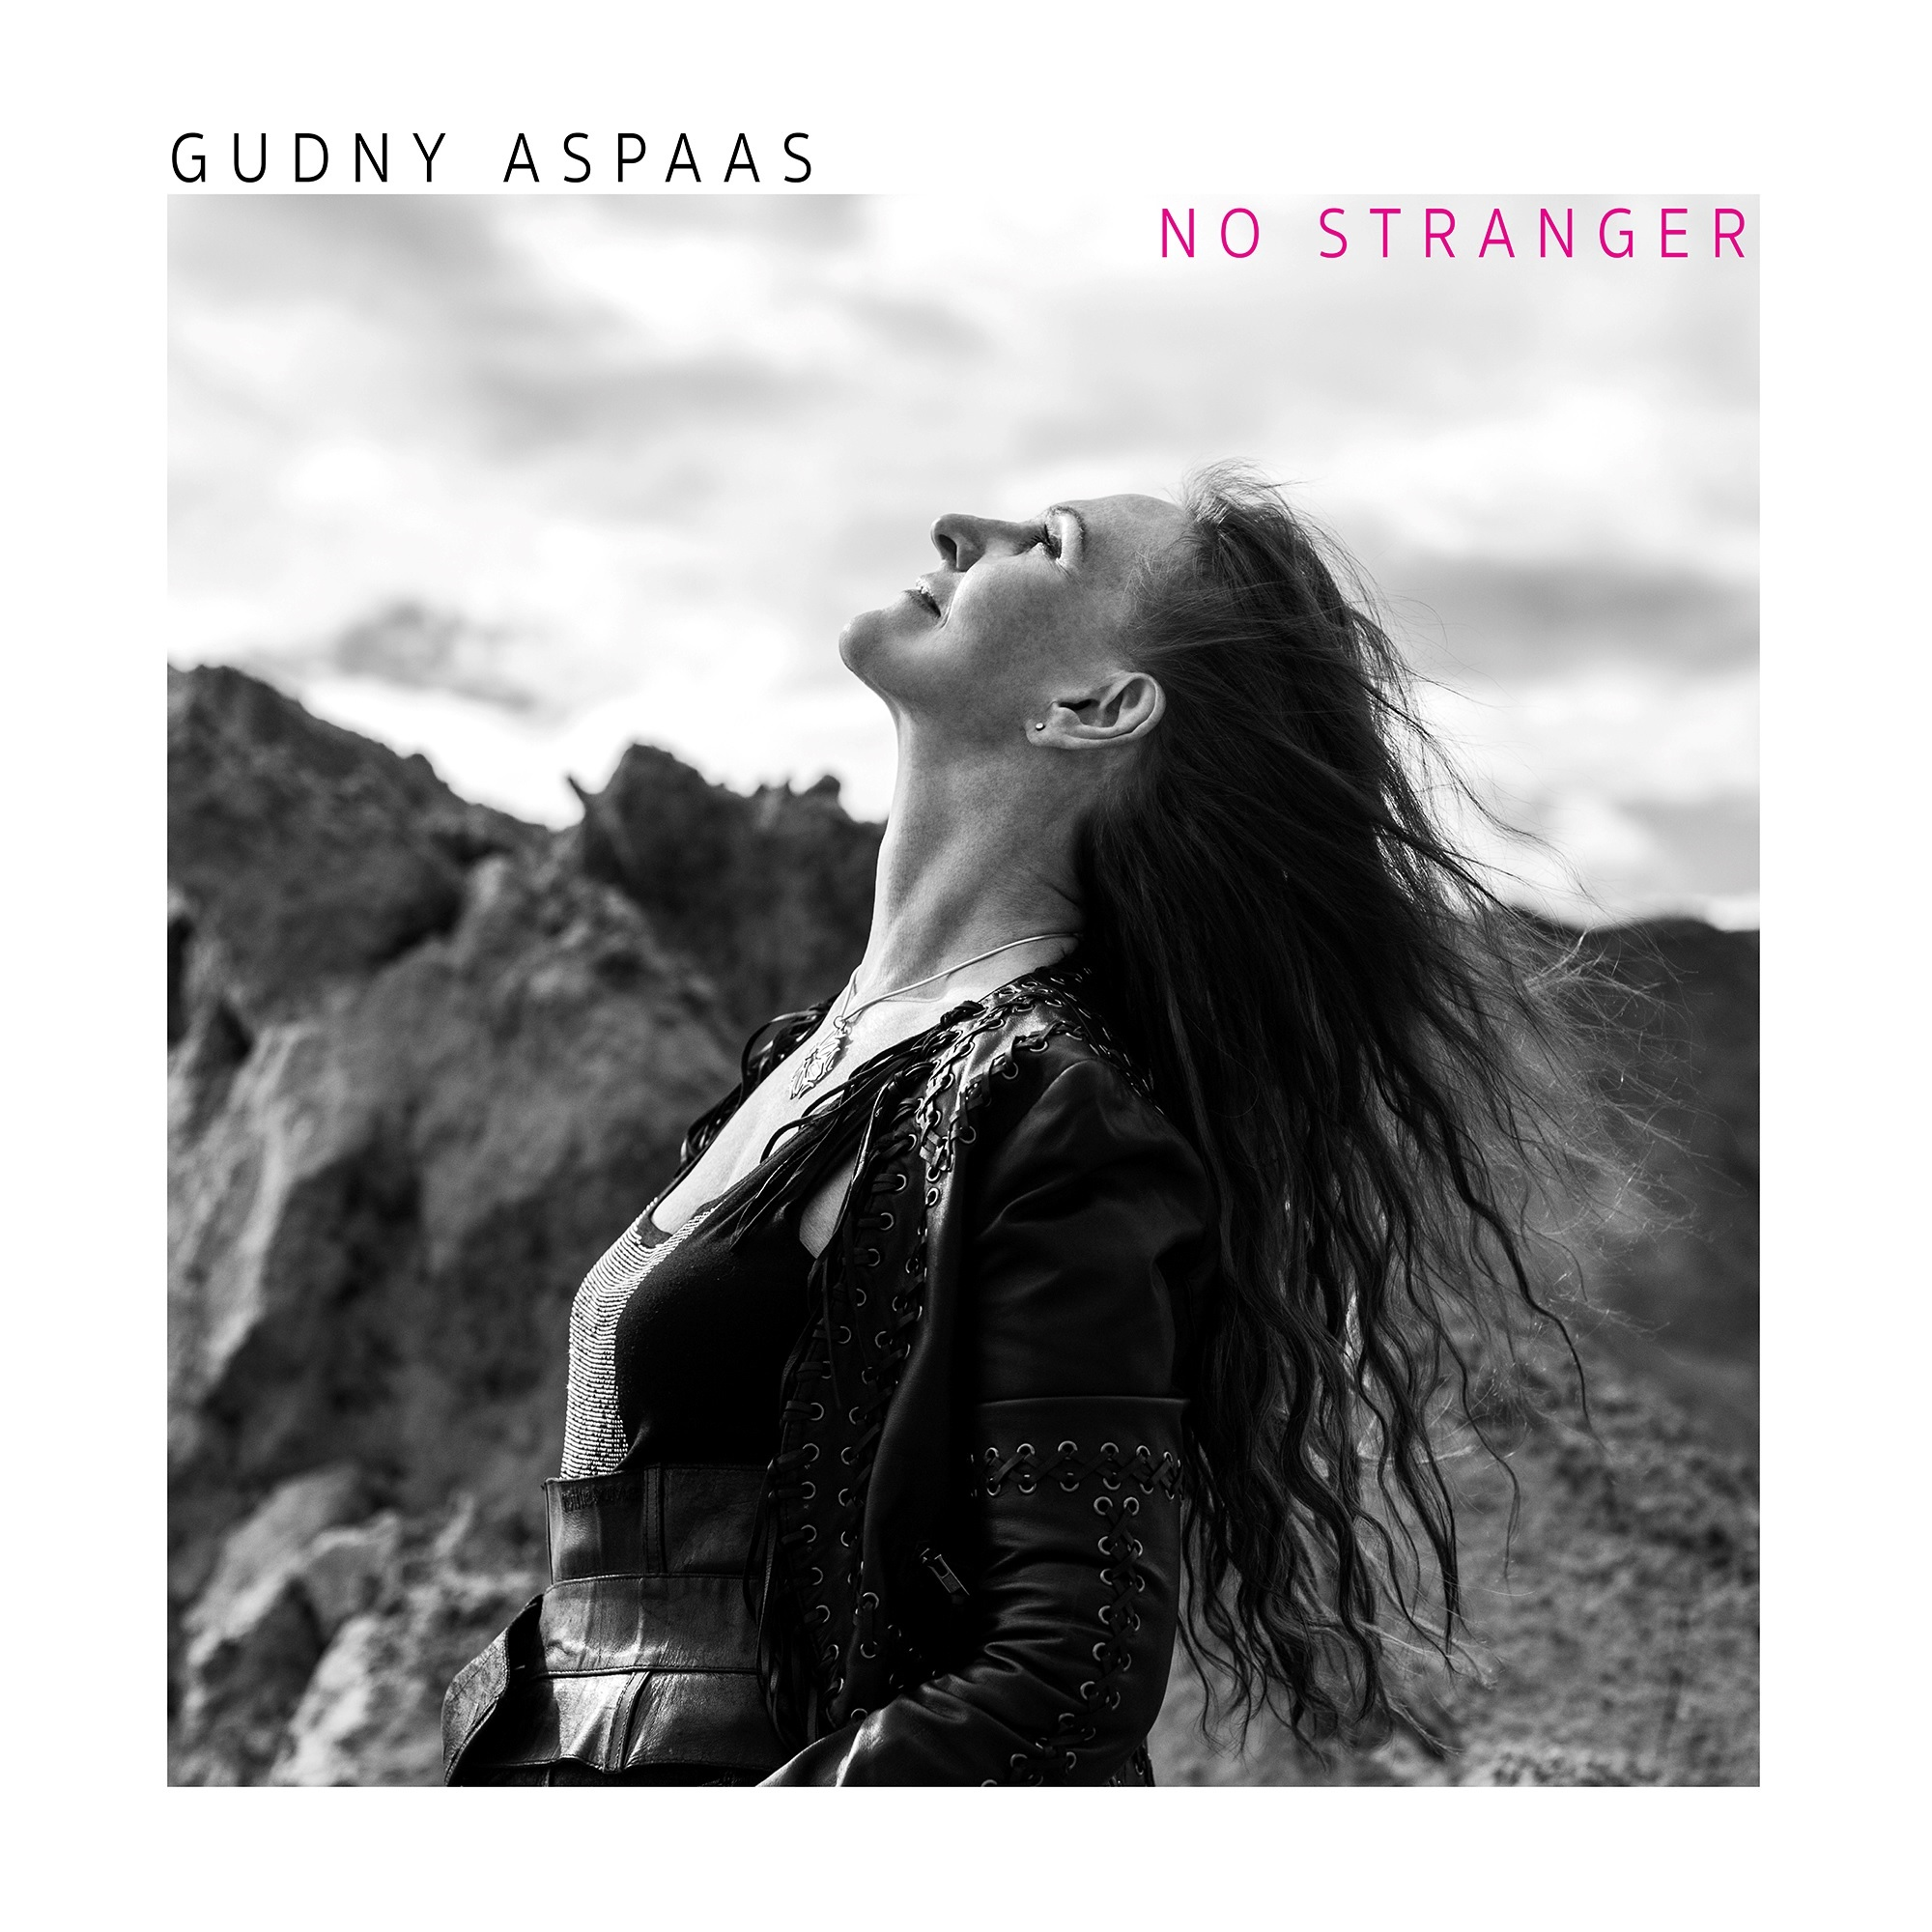 Gudny Aspaas - No Stranger